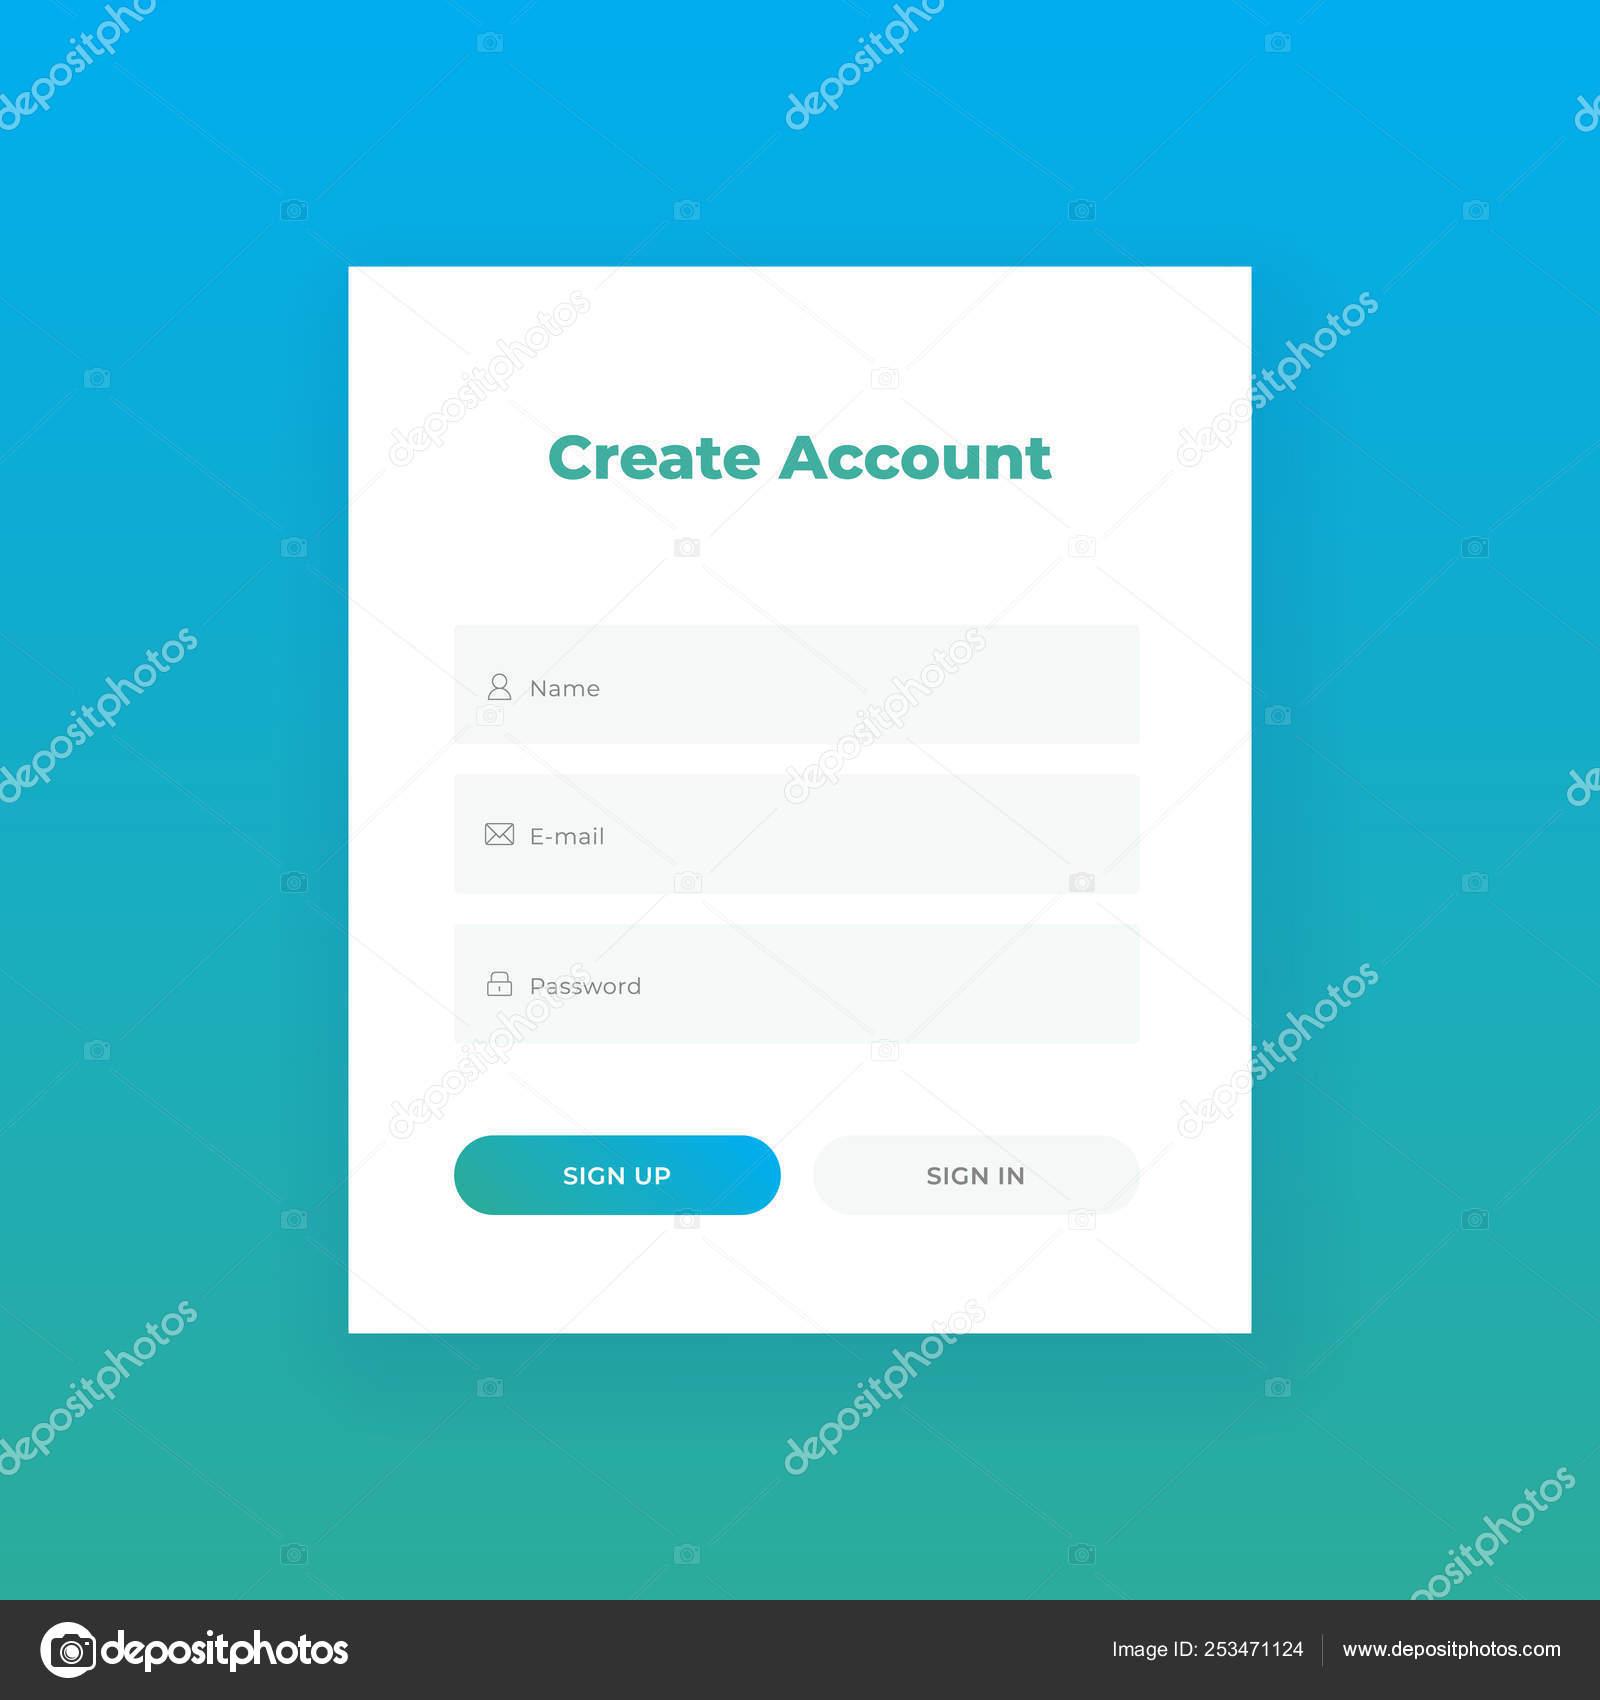 Create Account Login Form For Web Site Material Design Ui